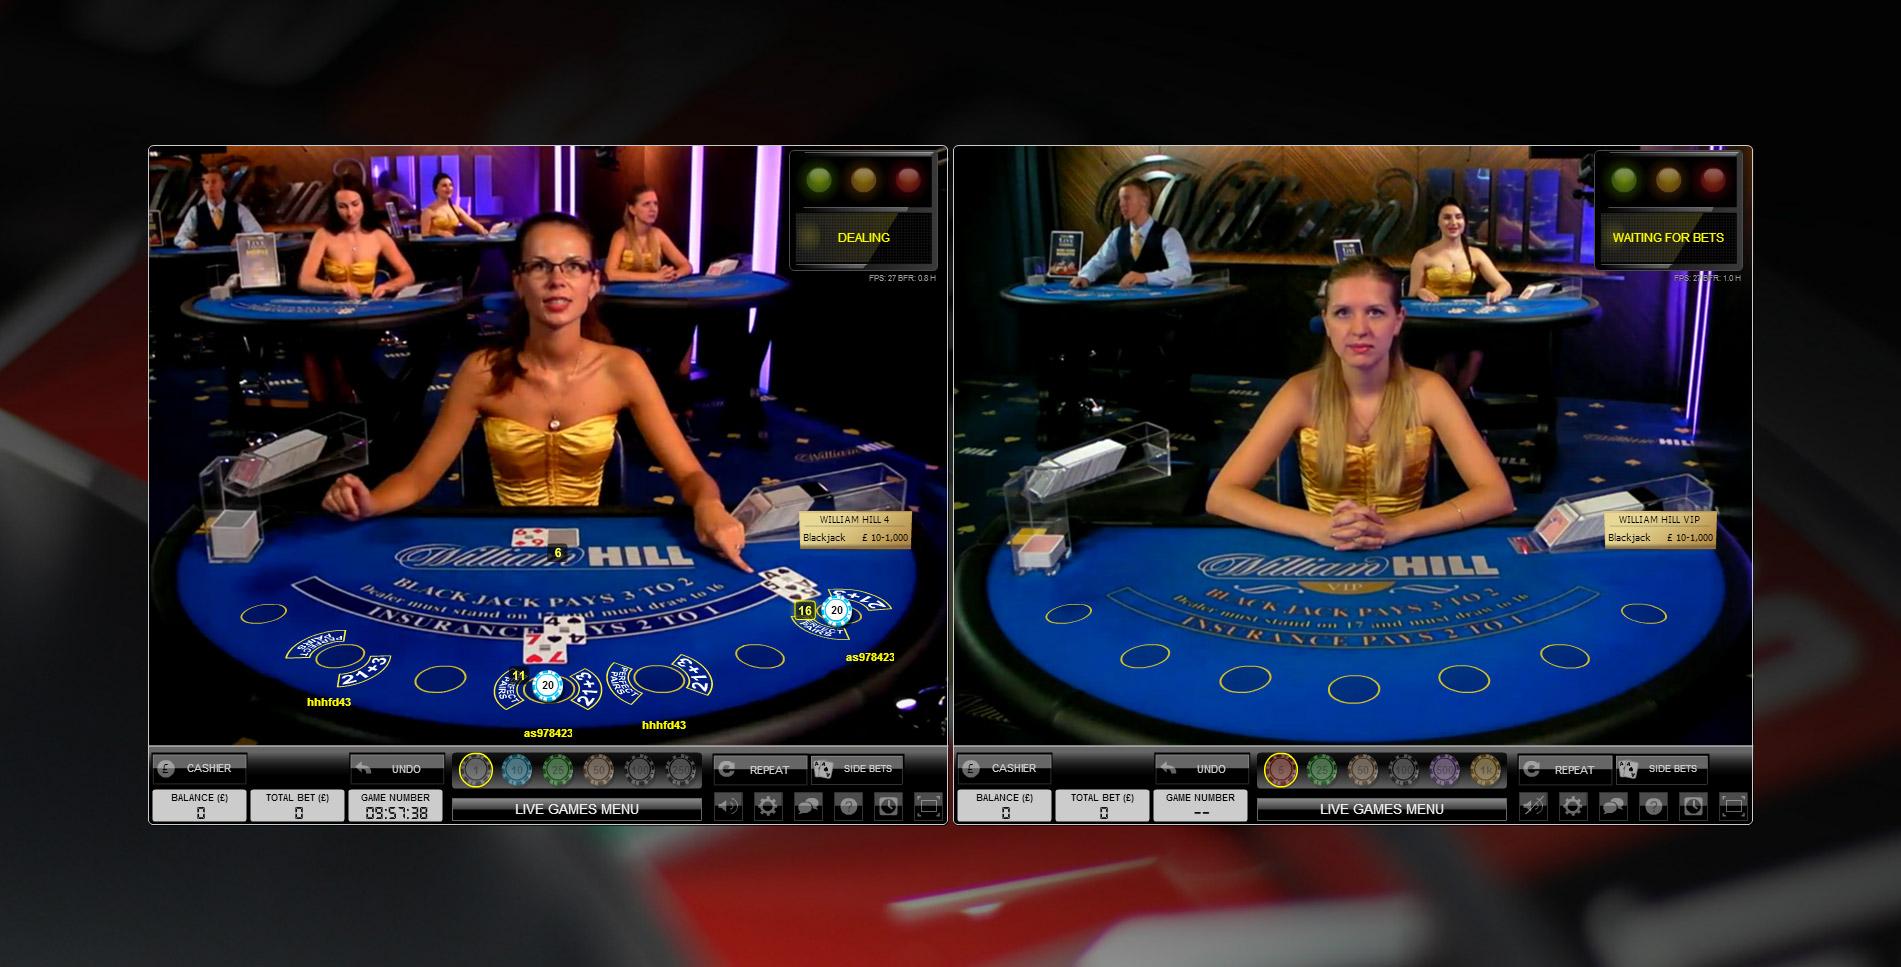 william hill casino casino tricks 24